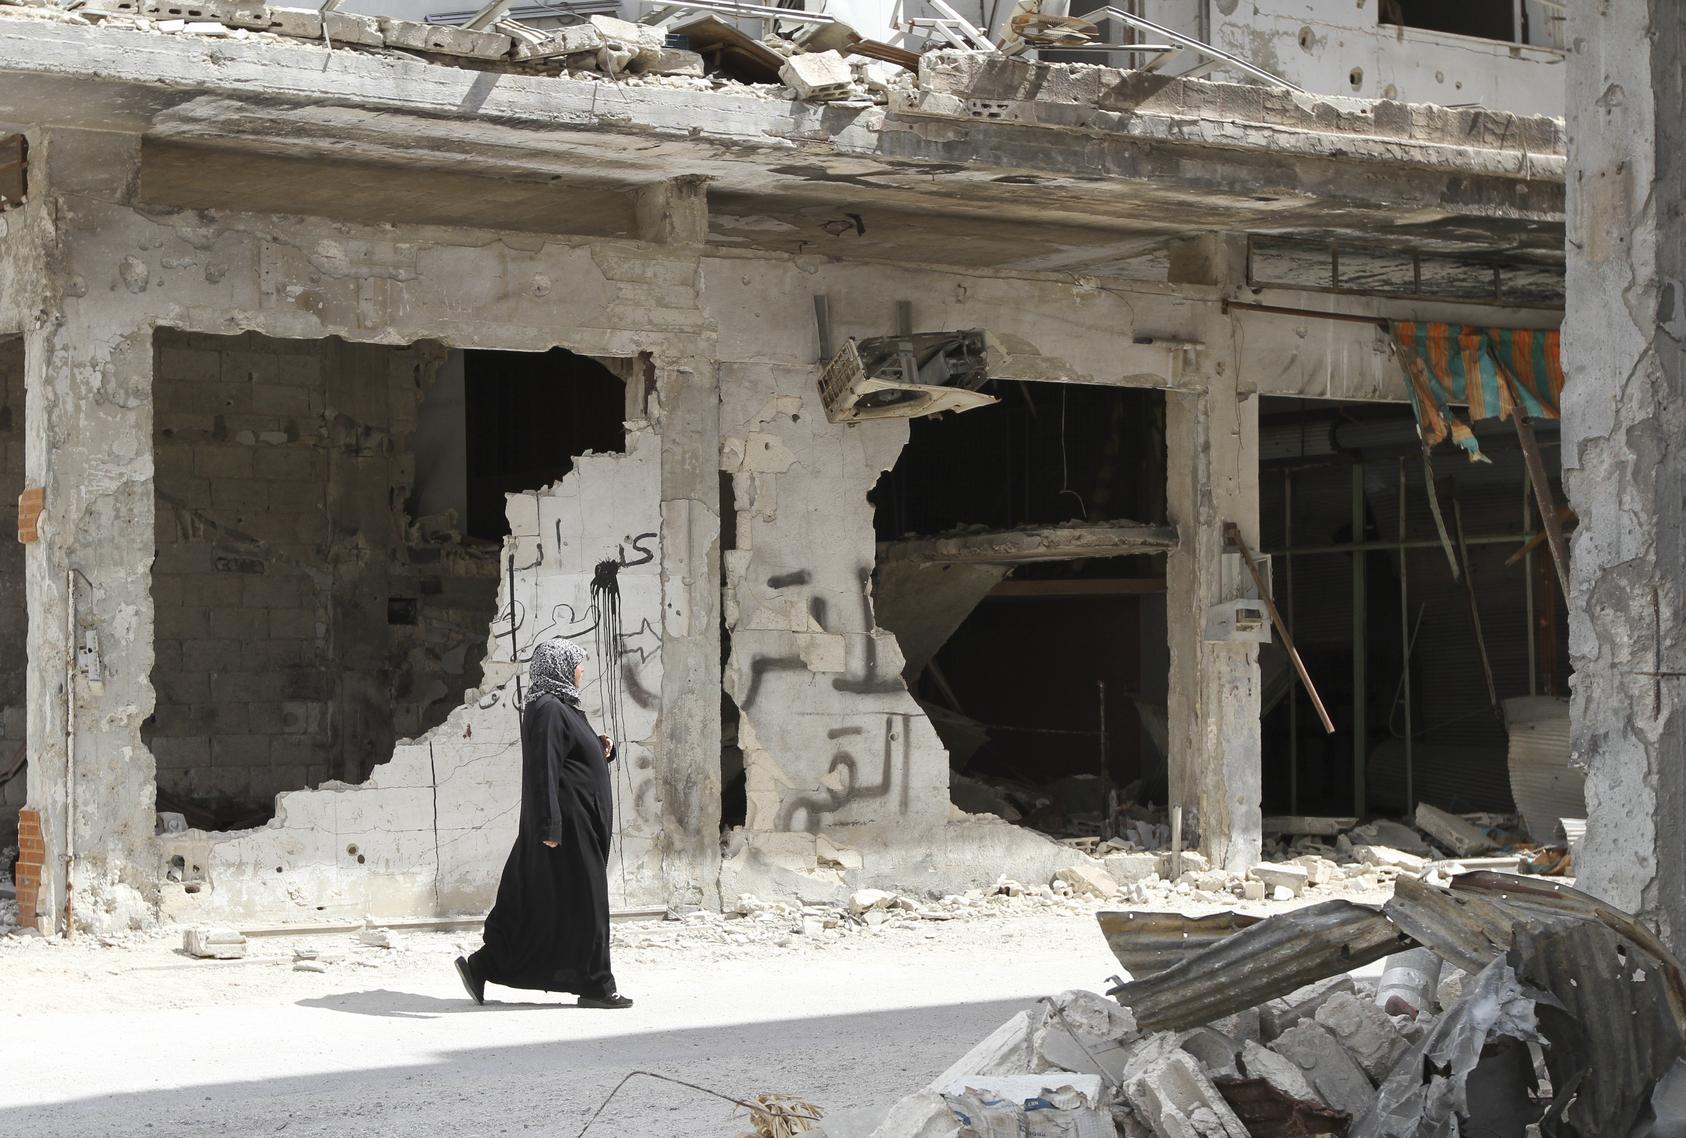 Homs, Syria, September 2013. Copyright: bwb-studio